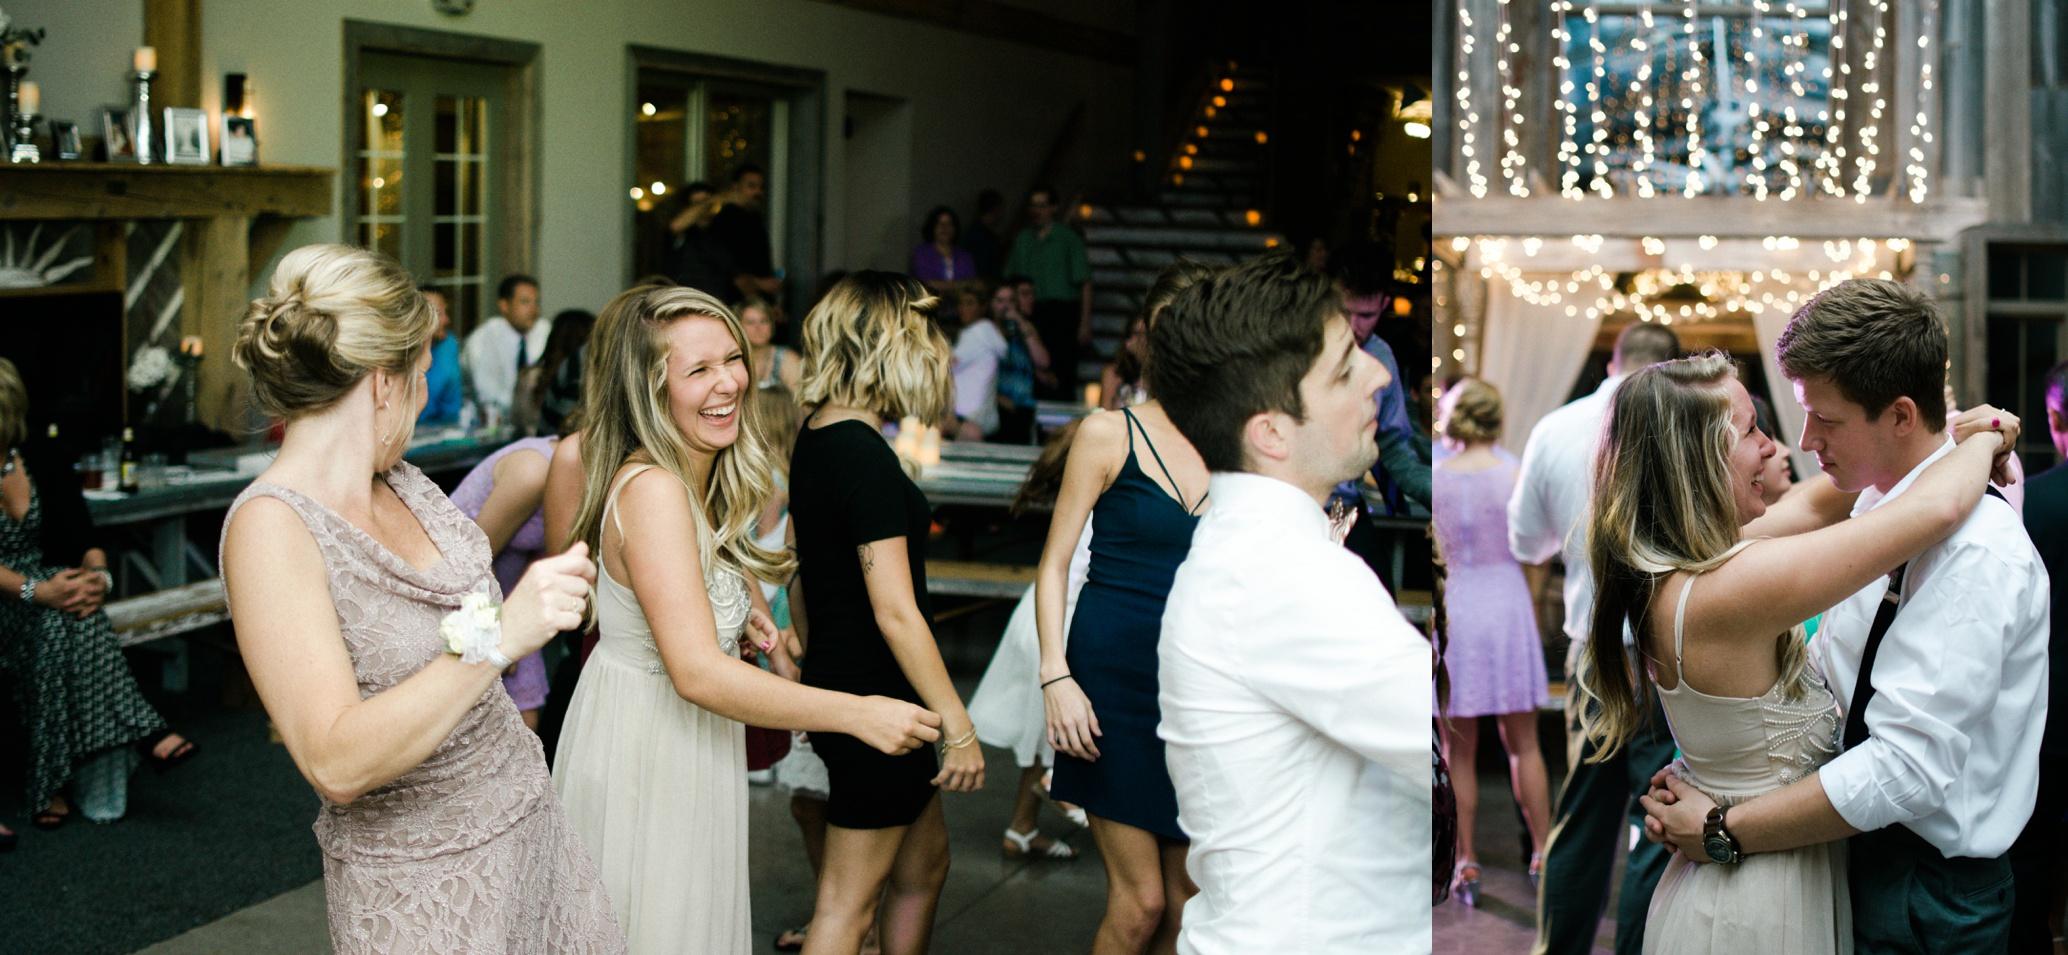 Barnes' Place Rustic Outdoor Wedding | Ali Leigh Photo Minneapolis Wedding Photographer_0180.jpg